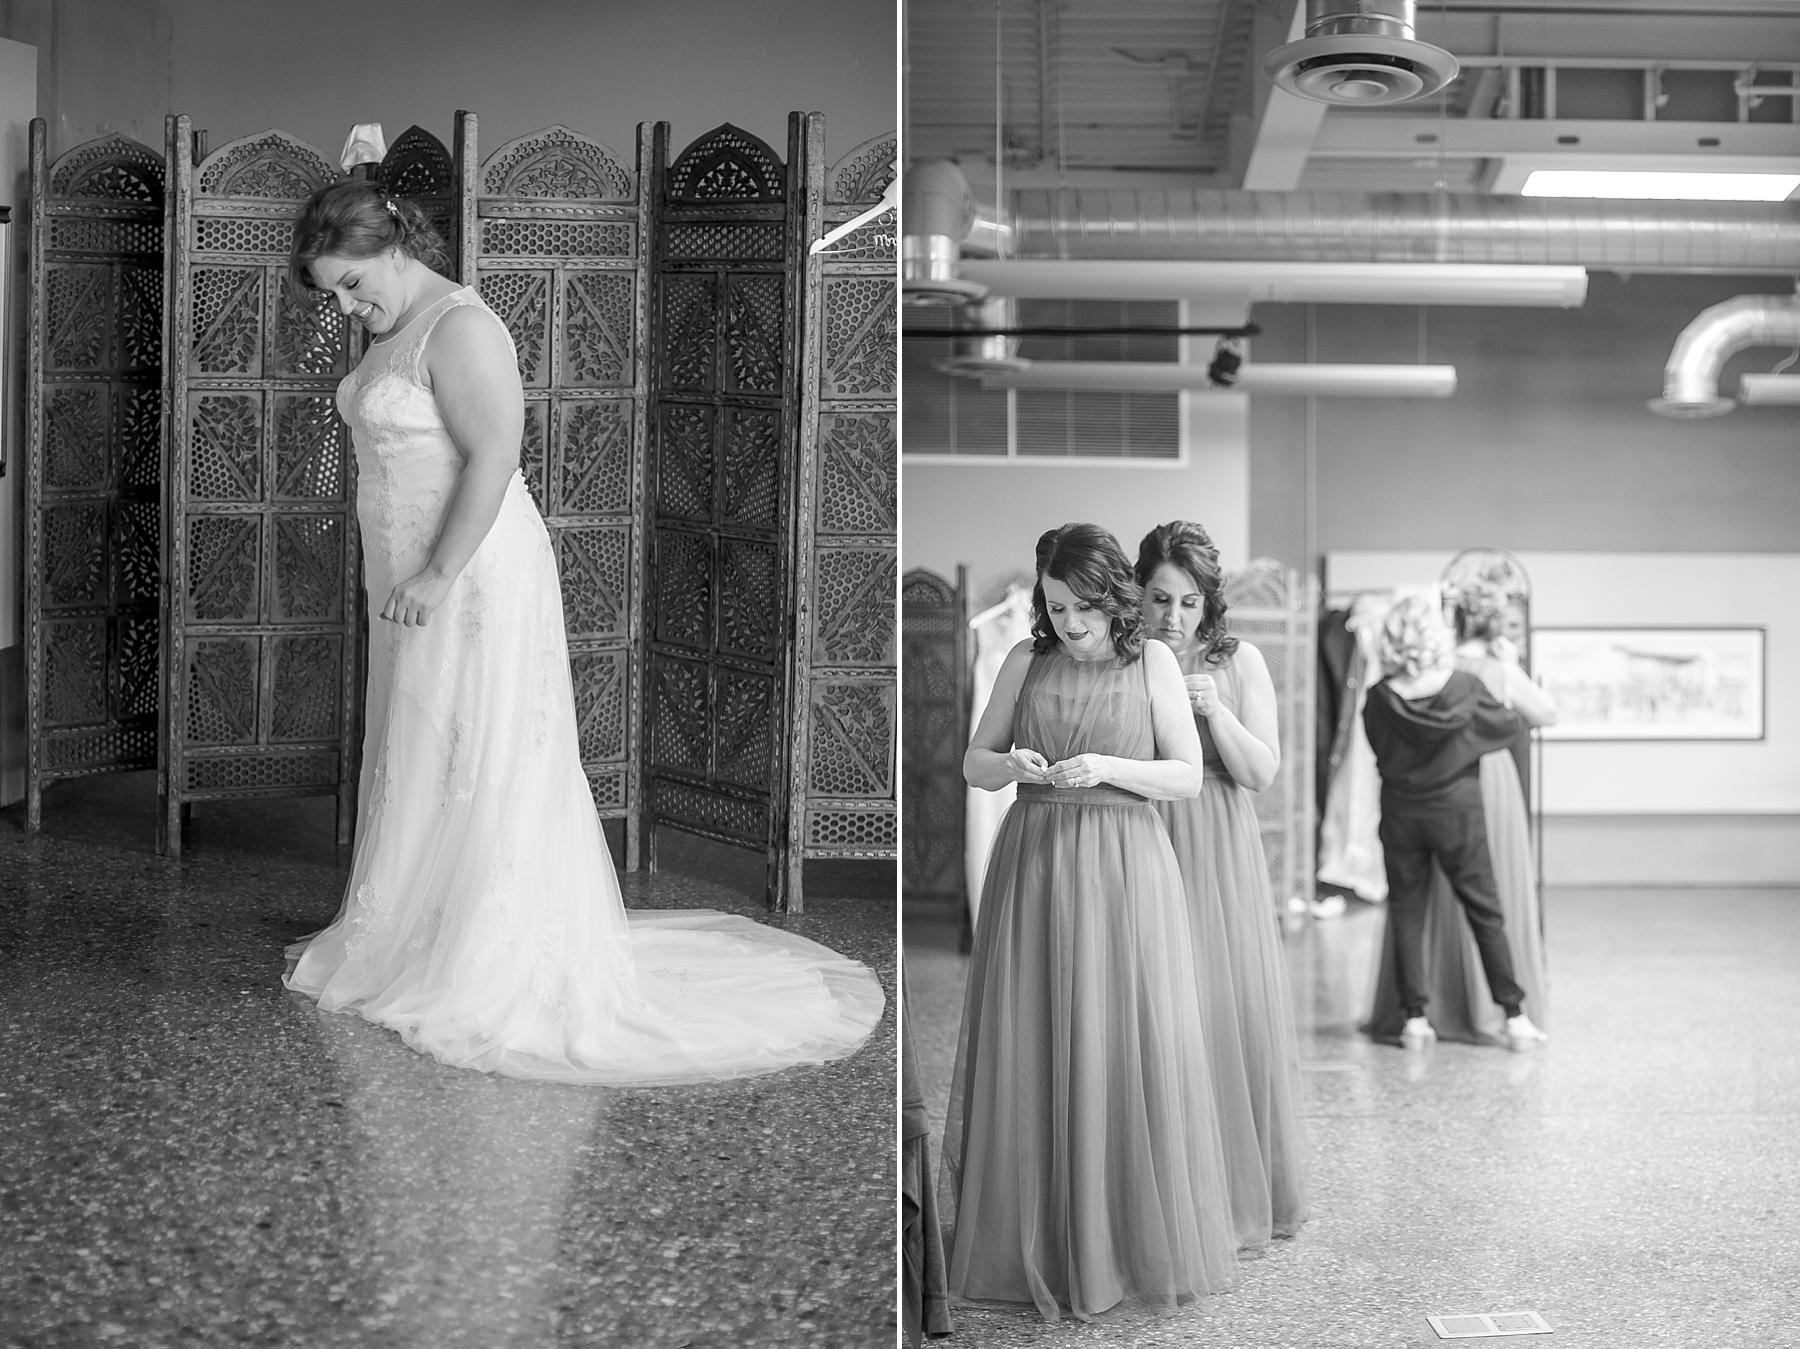 springs_preserve_las_vegas_wedding_photos-07.jpg